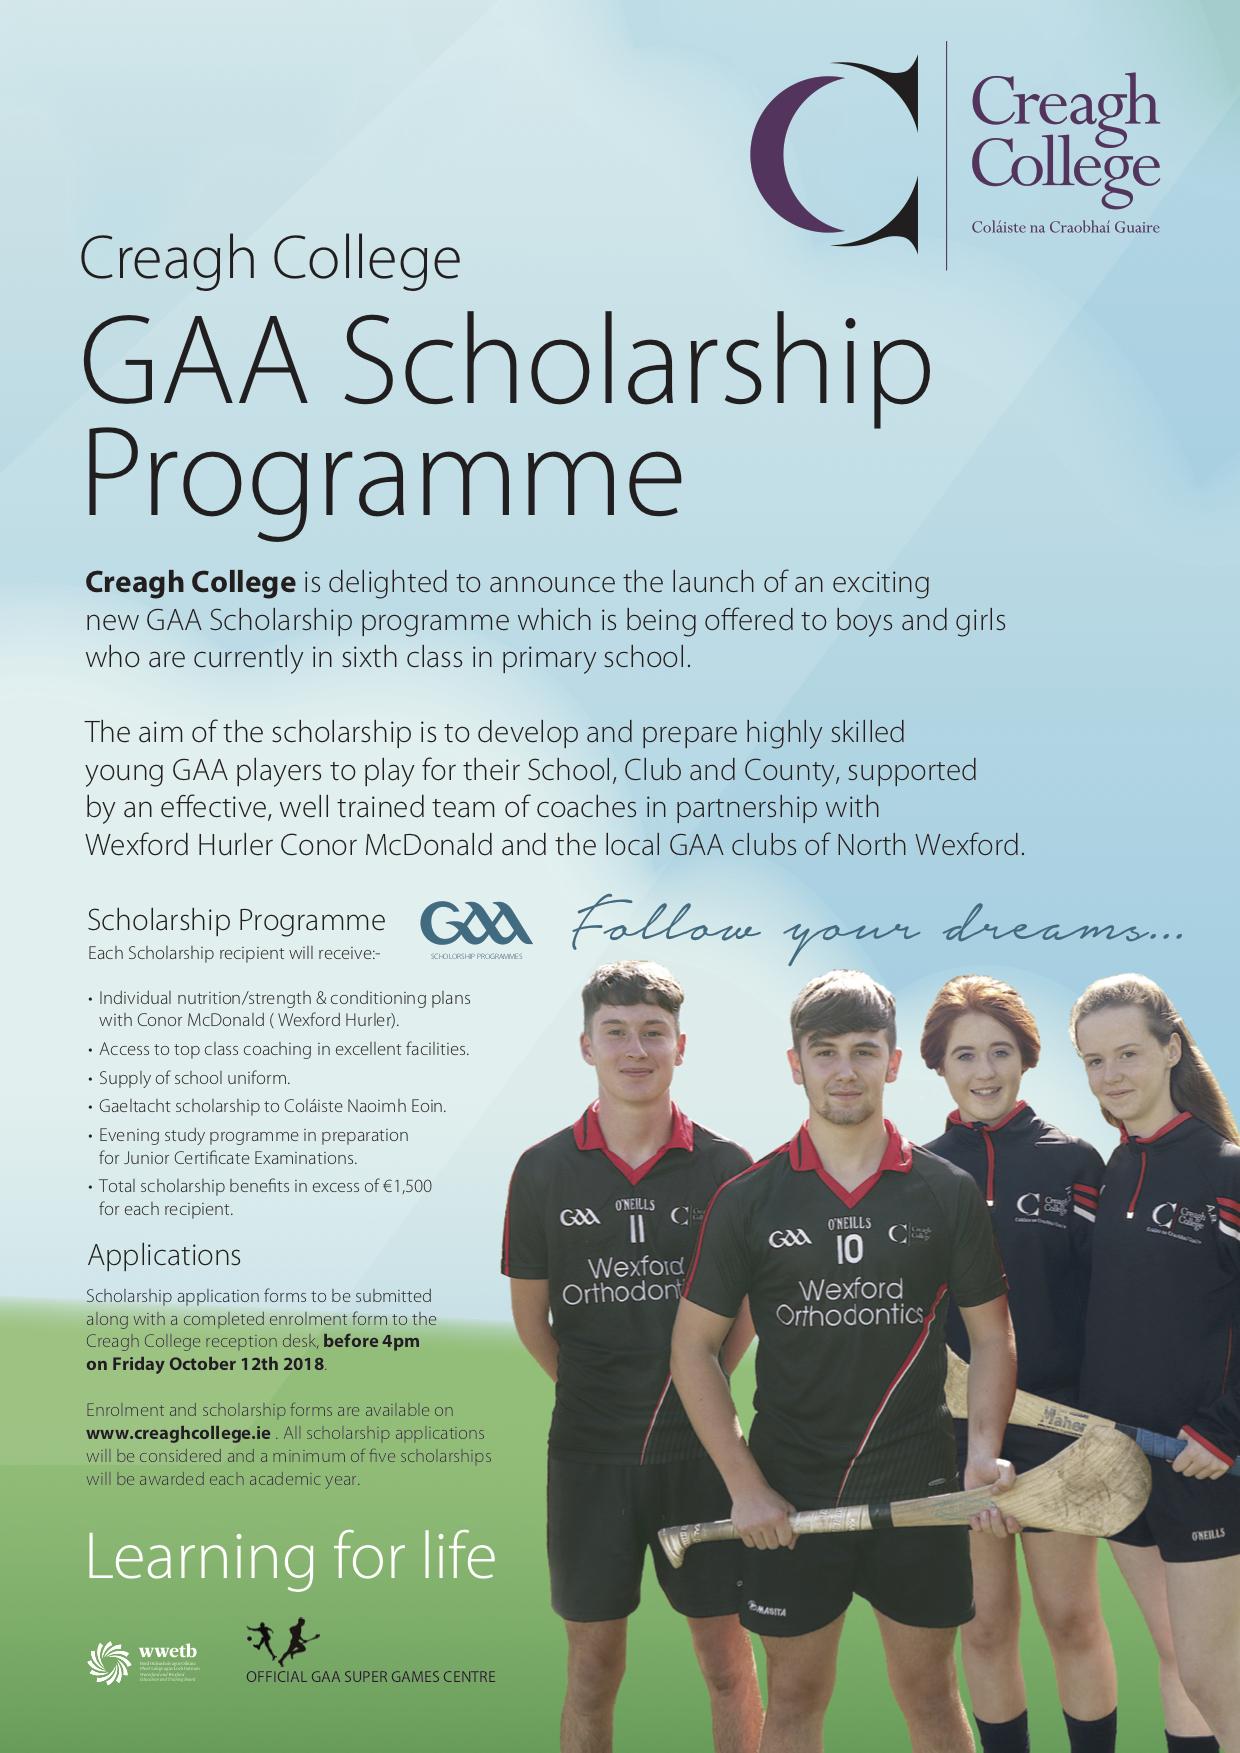 New GAA Scholarship